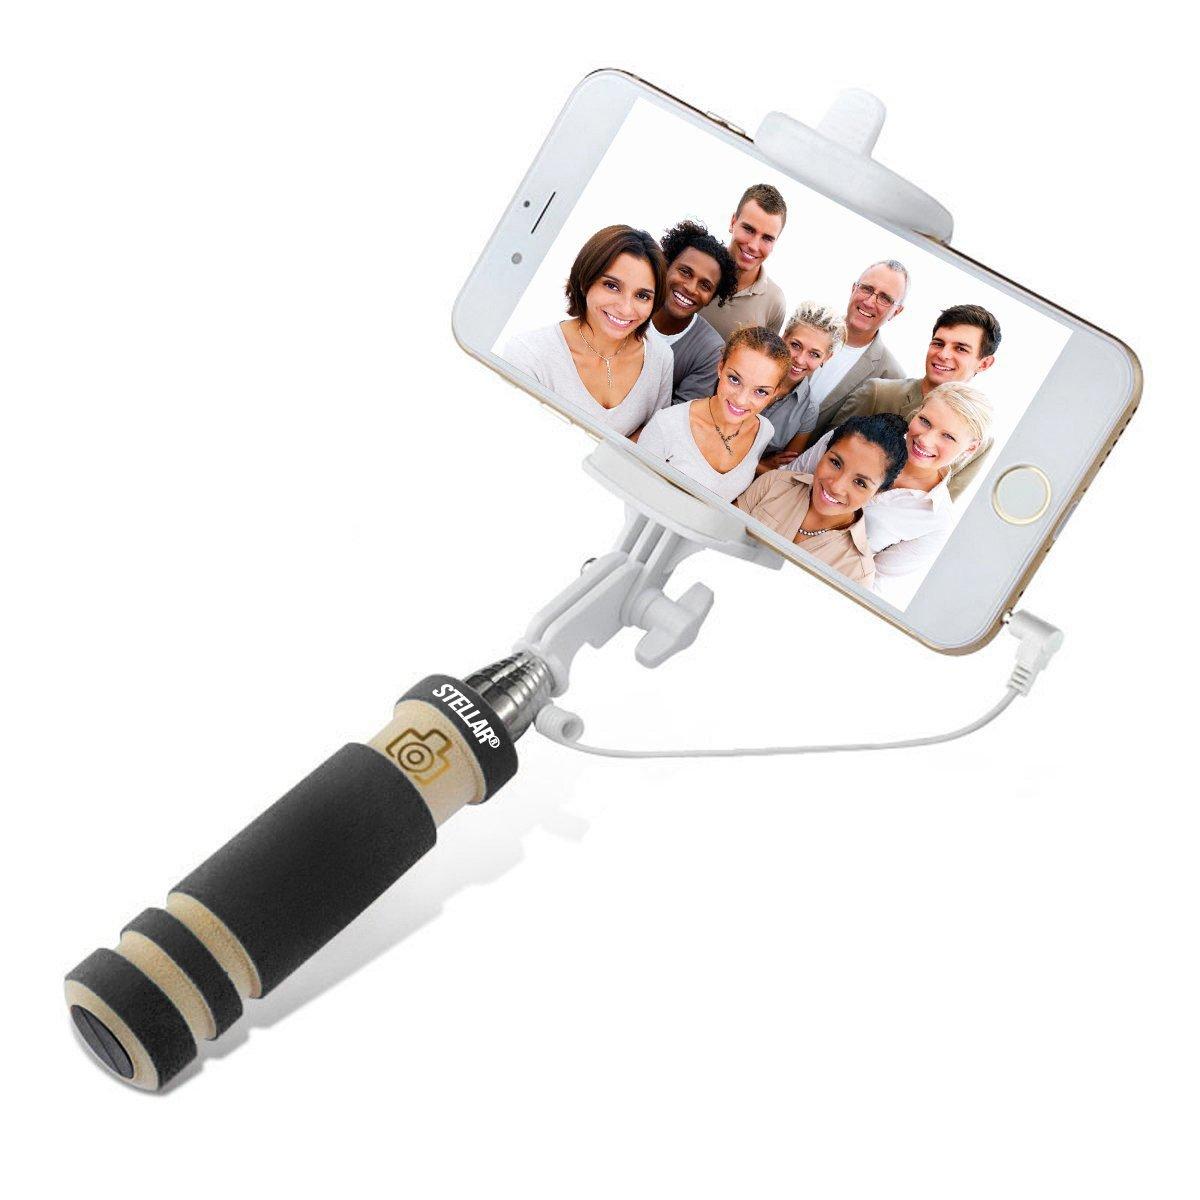 Selfie Stick by Stellar(TM) 1 Piece U-Shape Folding Selfie Stick Does Not Spin Extendable No Bluetooth No Batteries Black Colour Universal Phone Holder Clip (NEW Version - Audio Cable)